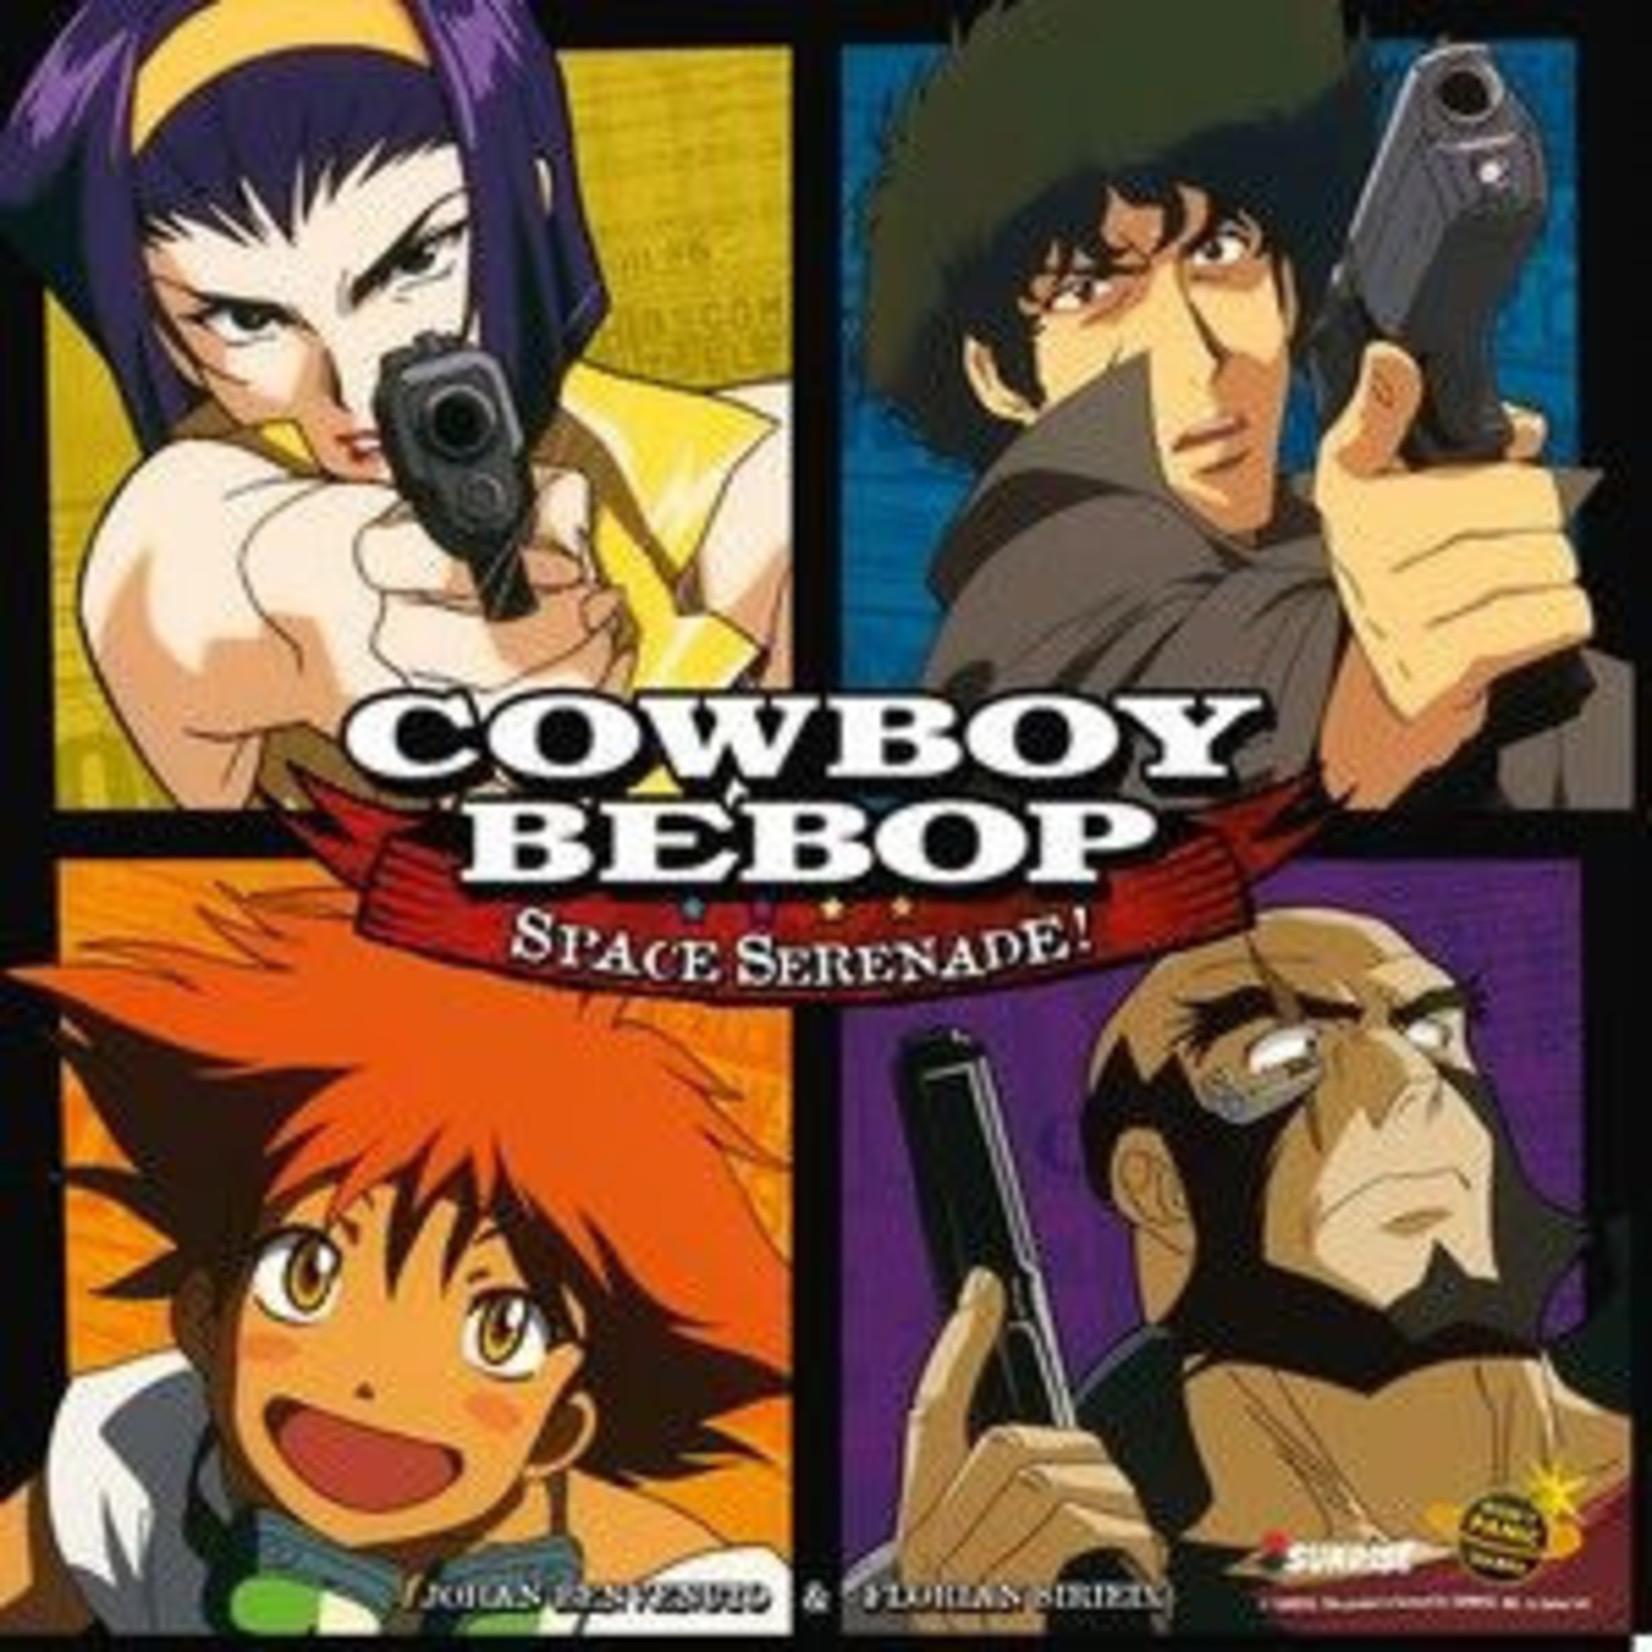 Don't Panic Games Cowboy Bebop - Space Serenade (FR)